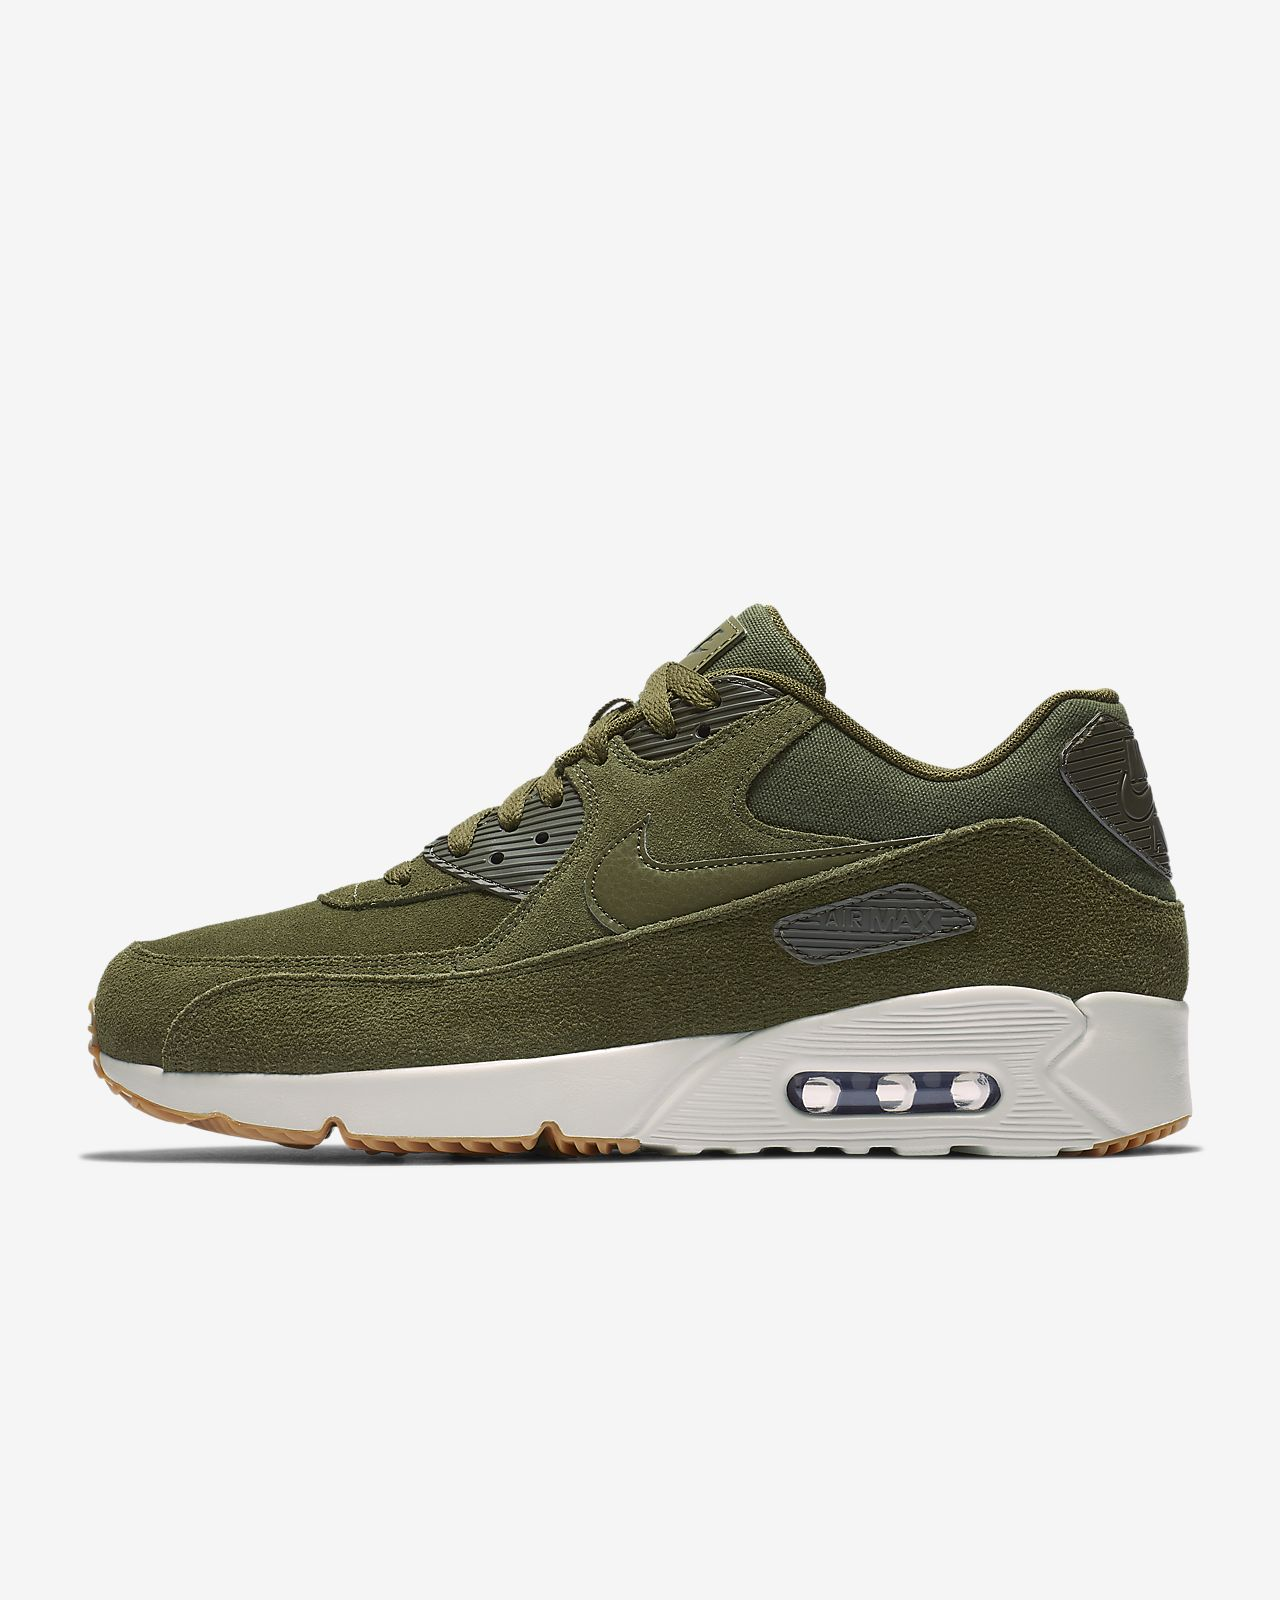 sports shoes f1258 915b7 ... Scarpa Nike Air Max 90 Ultra 2.0 - Uomo